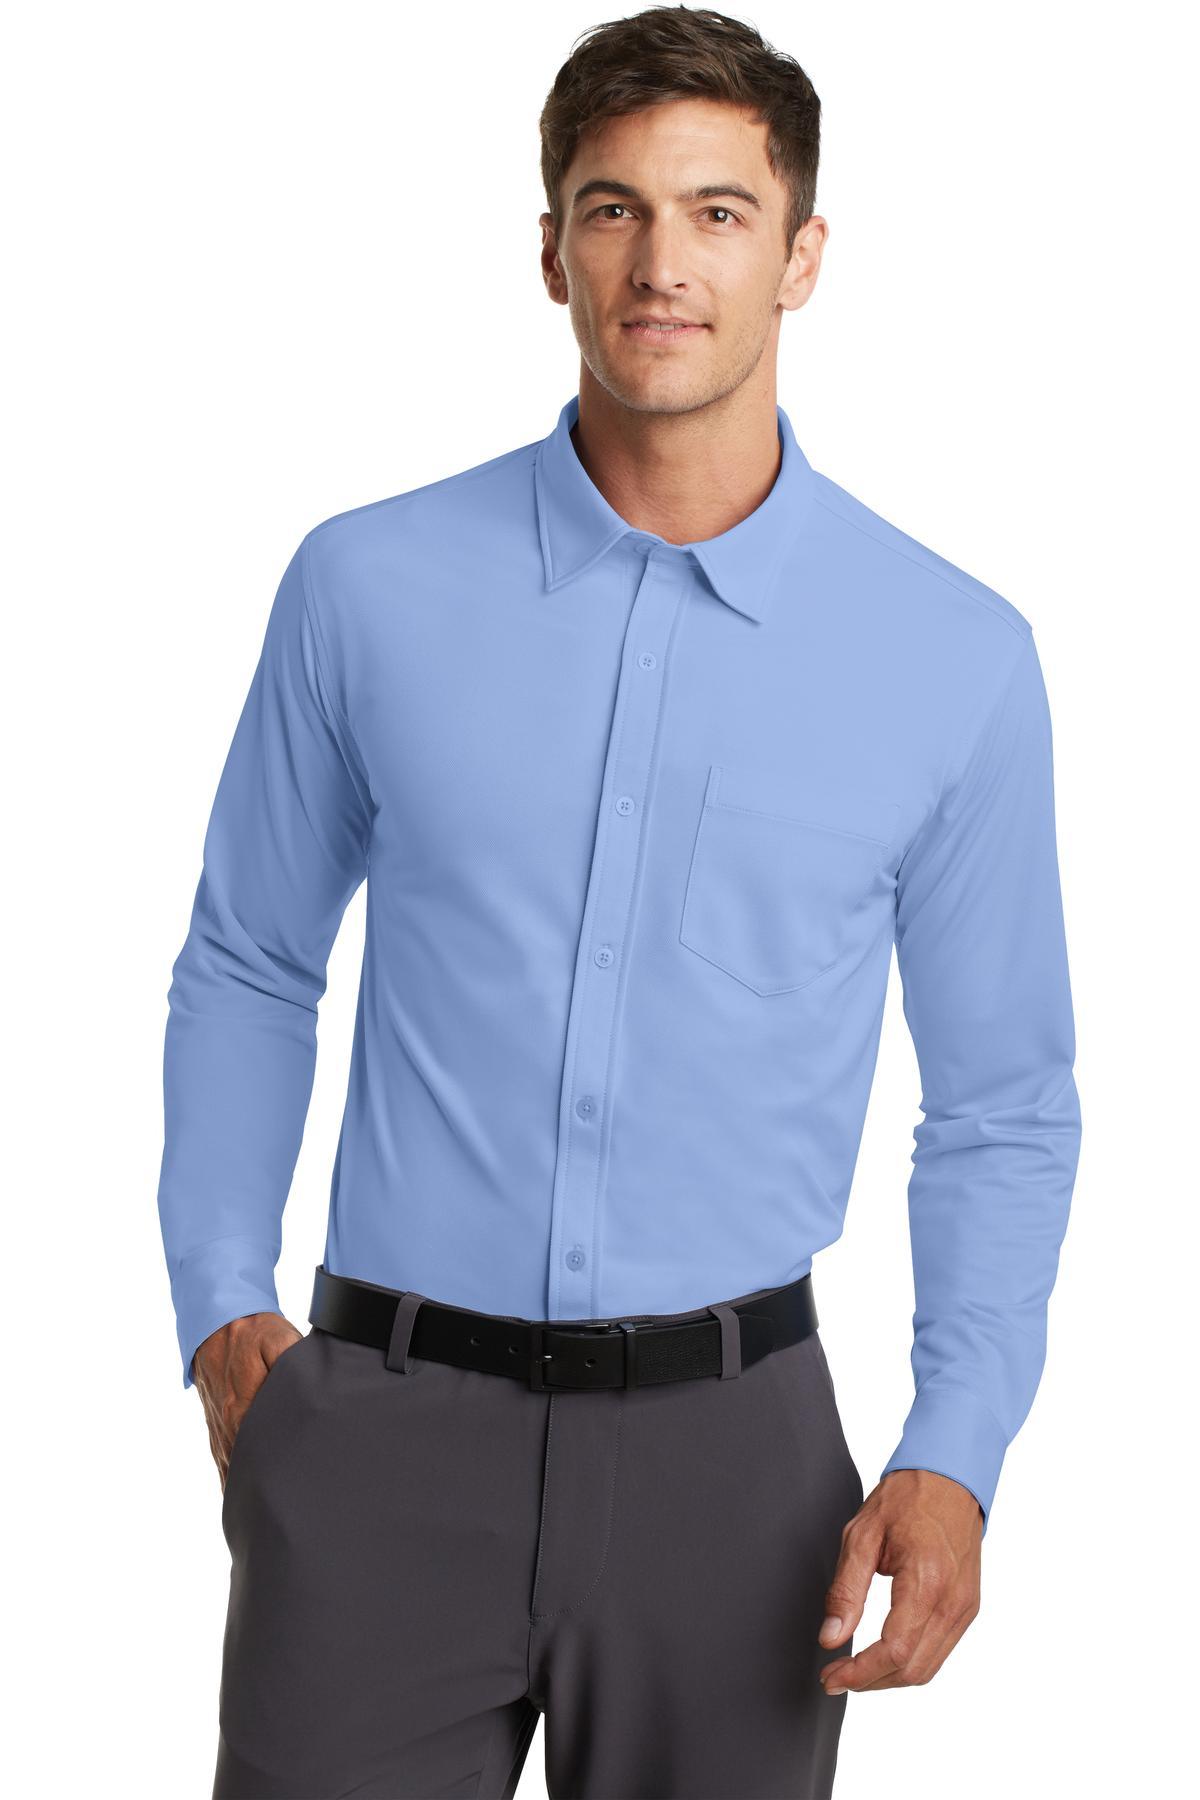 Port Authority® K570 - Dimension Knit Dress Shirt